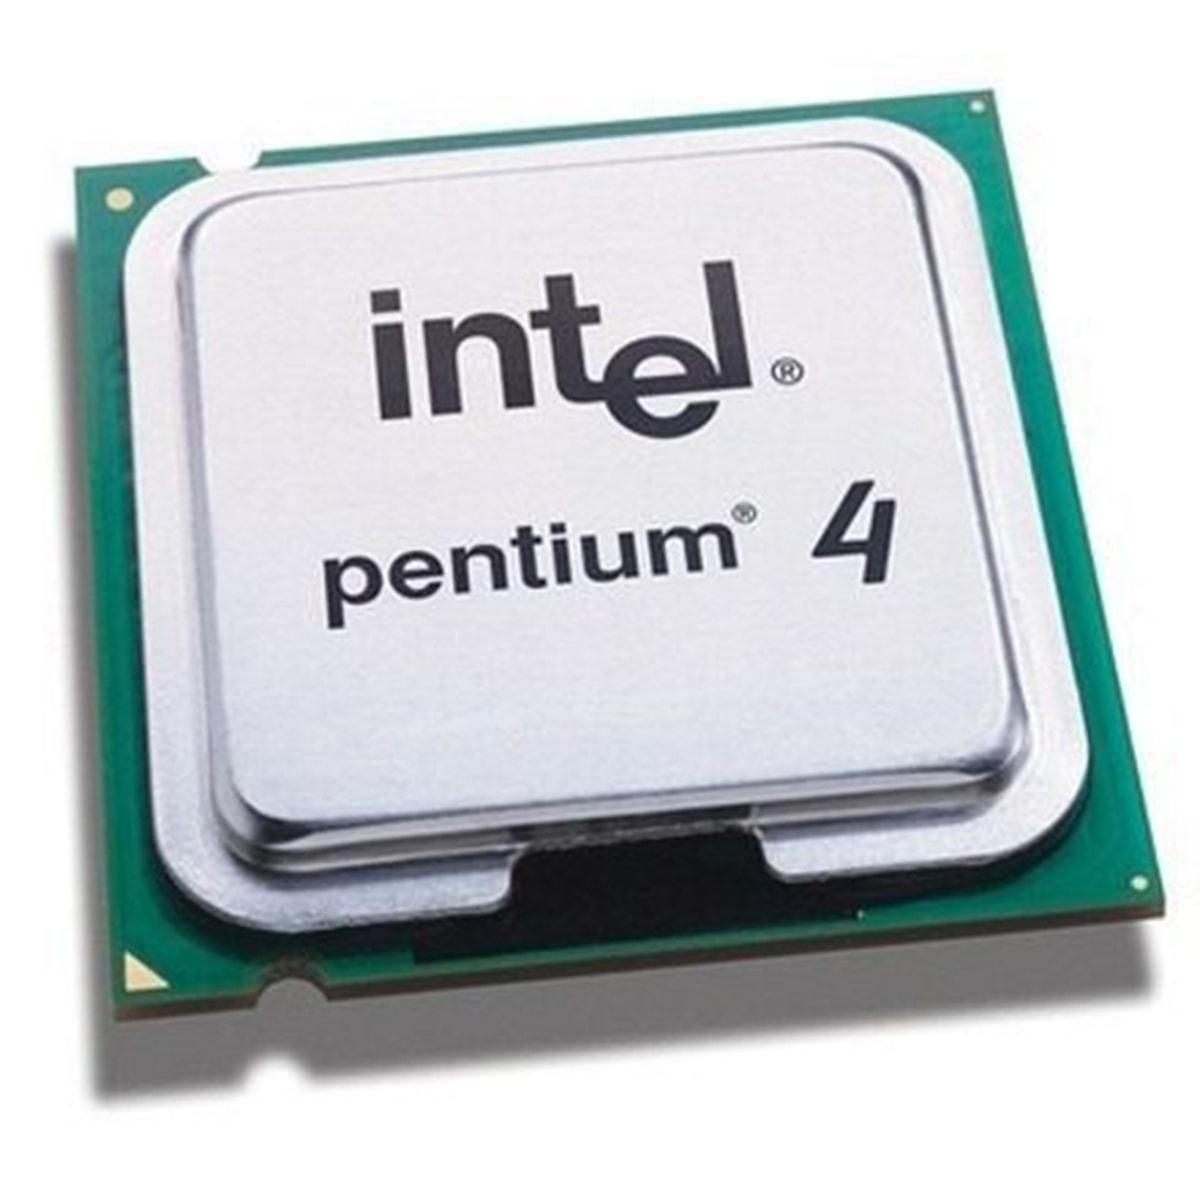 Processador Intel Pentium 4 HT 531 1M Cache / 3.00 GHz / 800 MHz / Socket 775 - Seminovo